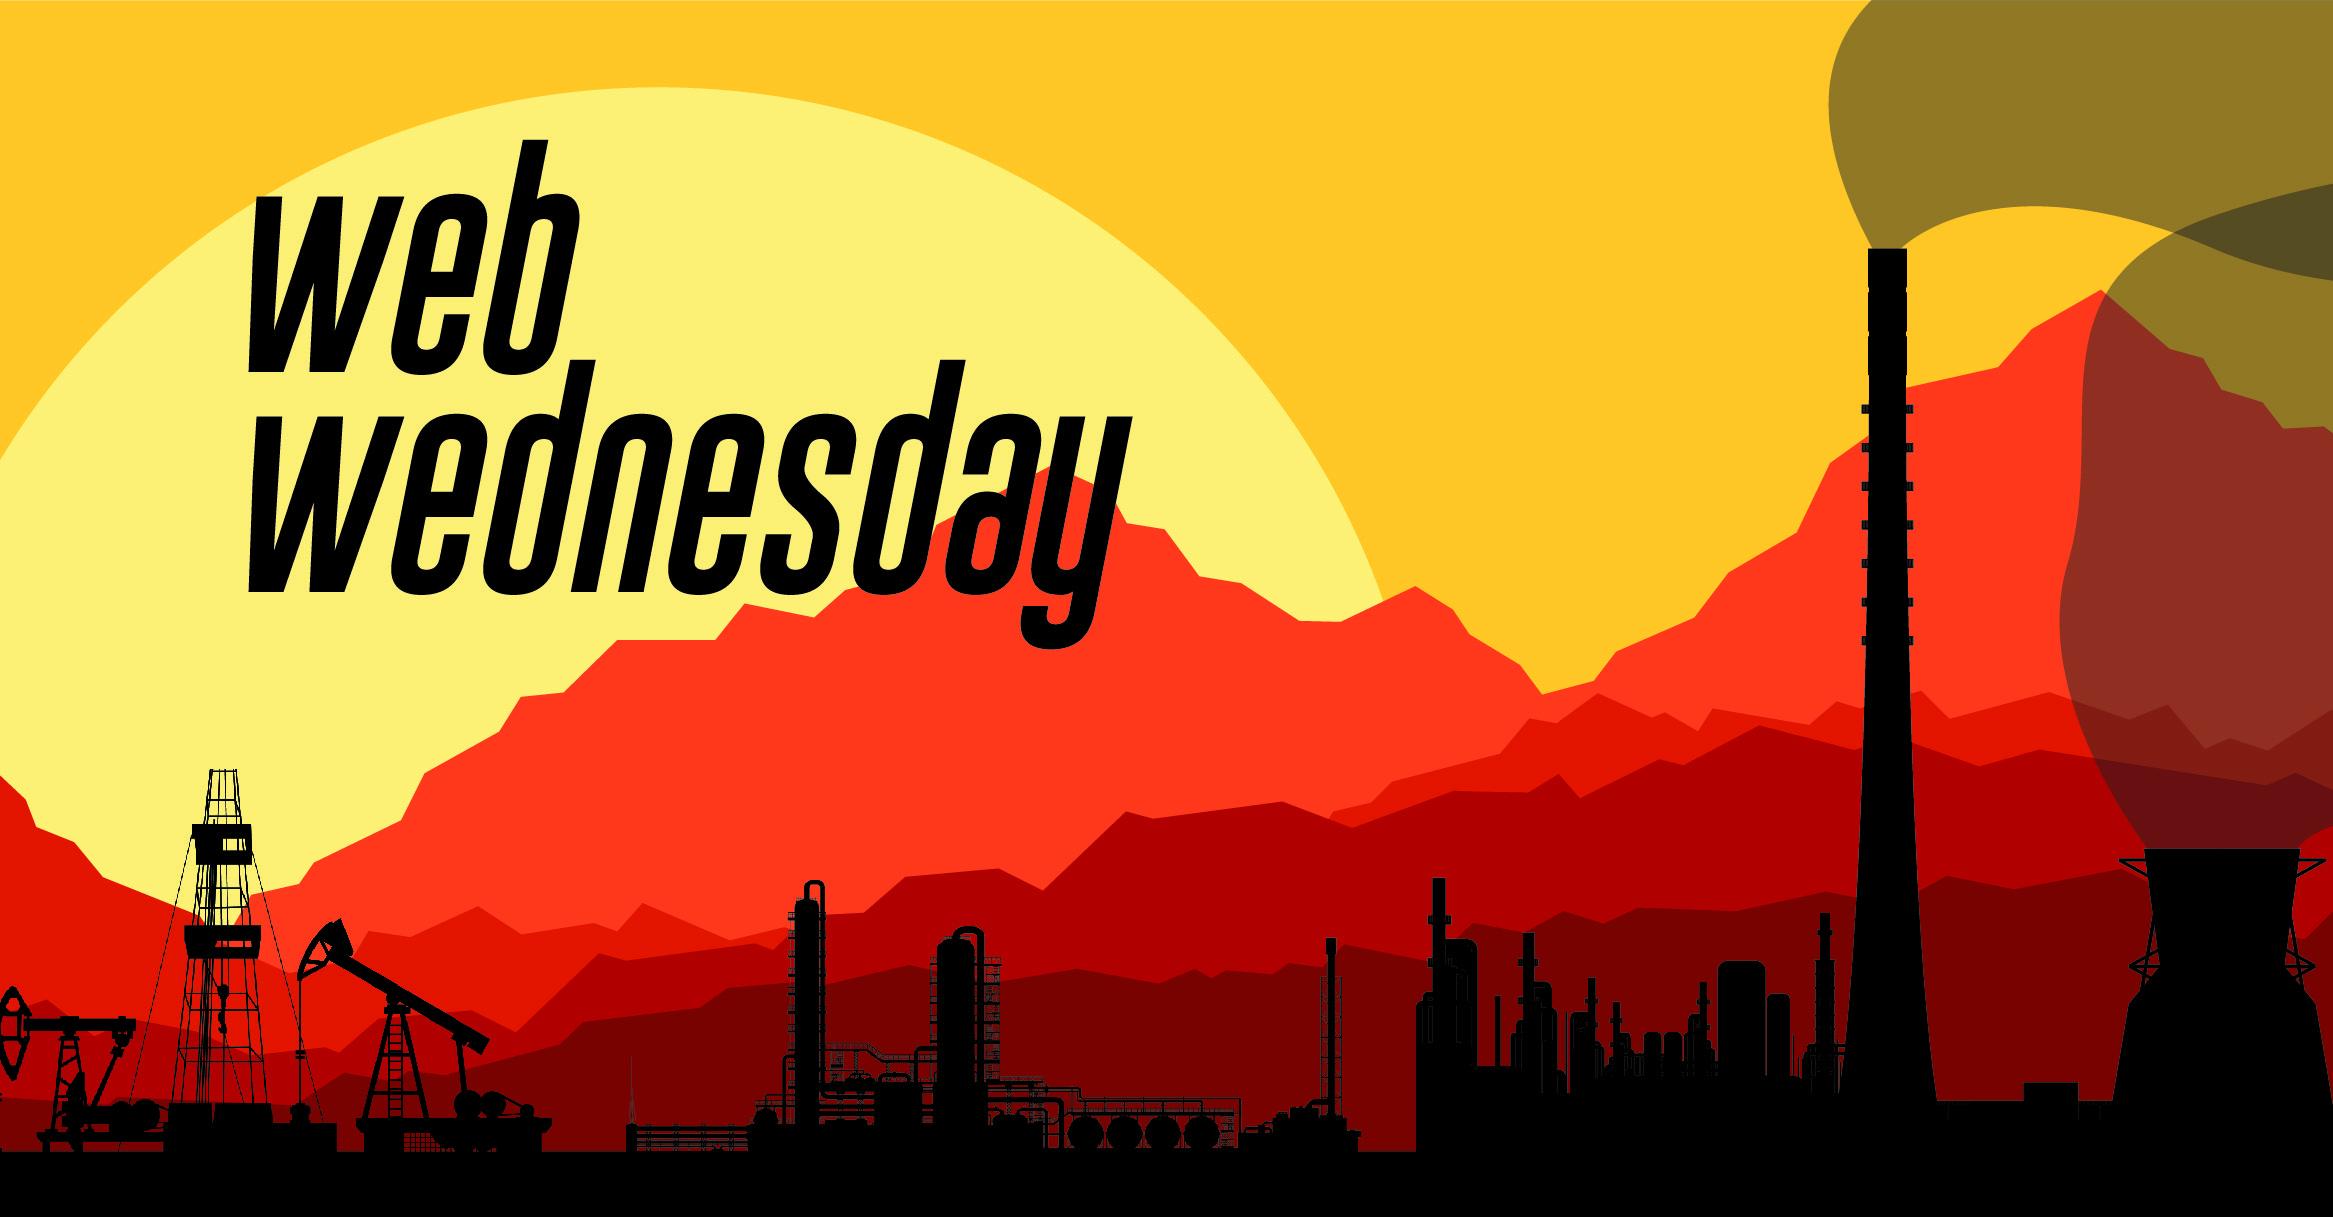 THM_Web_Wednesday.jpg